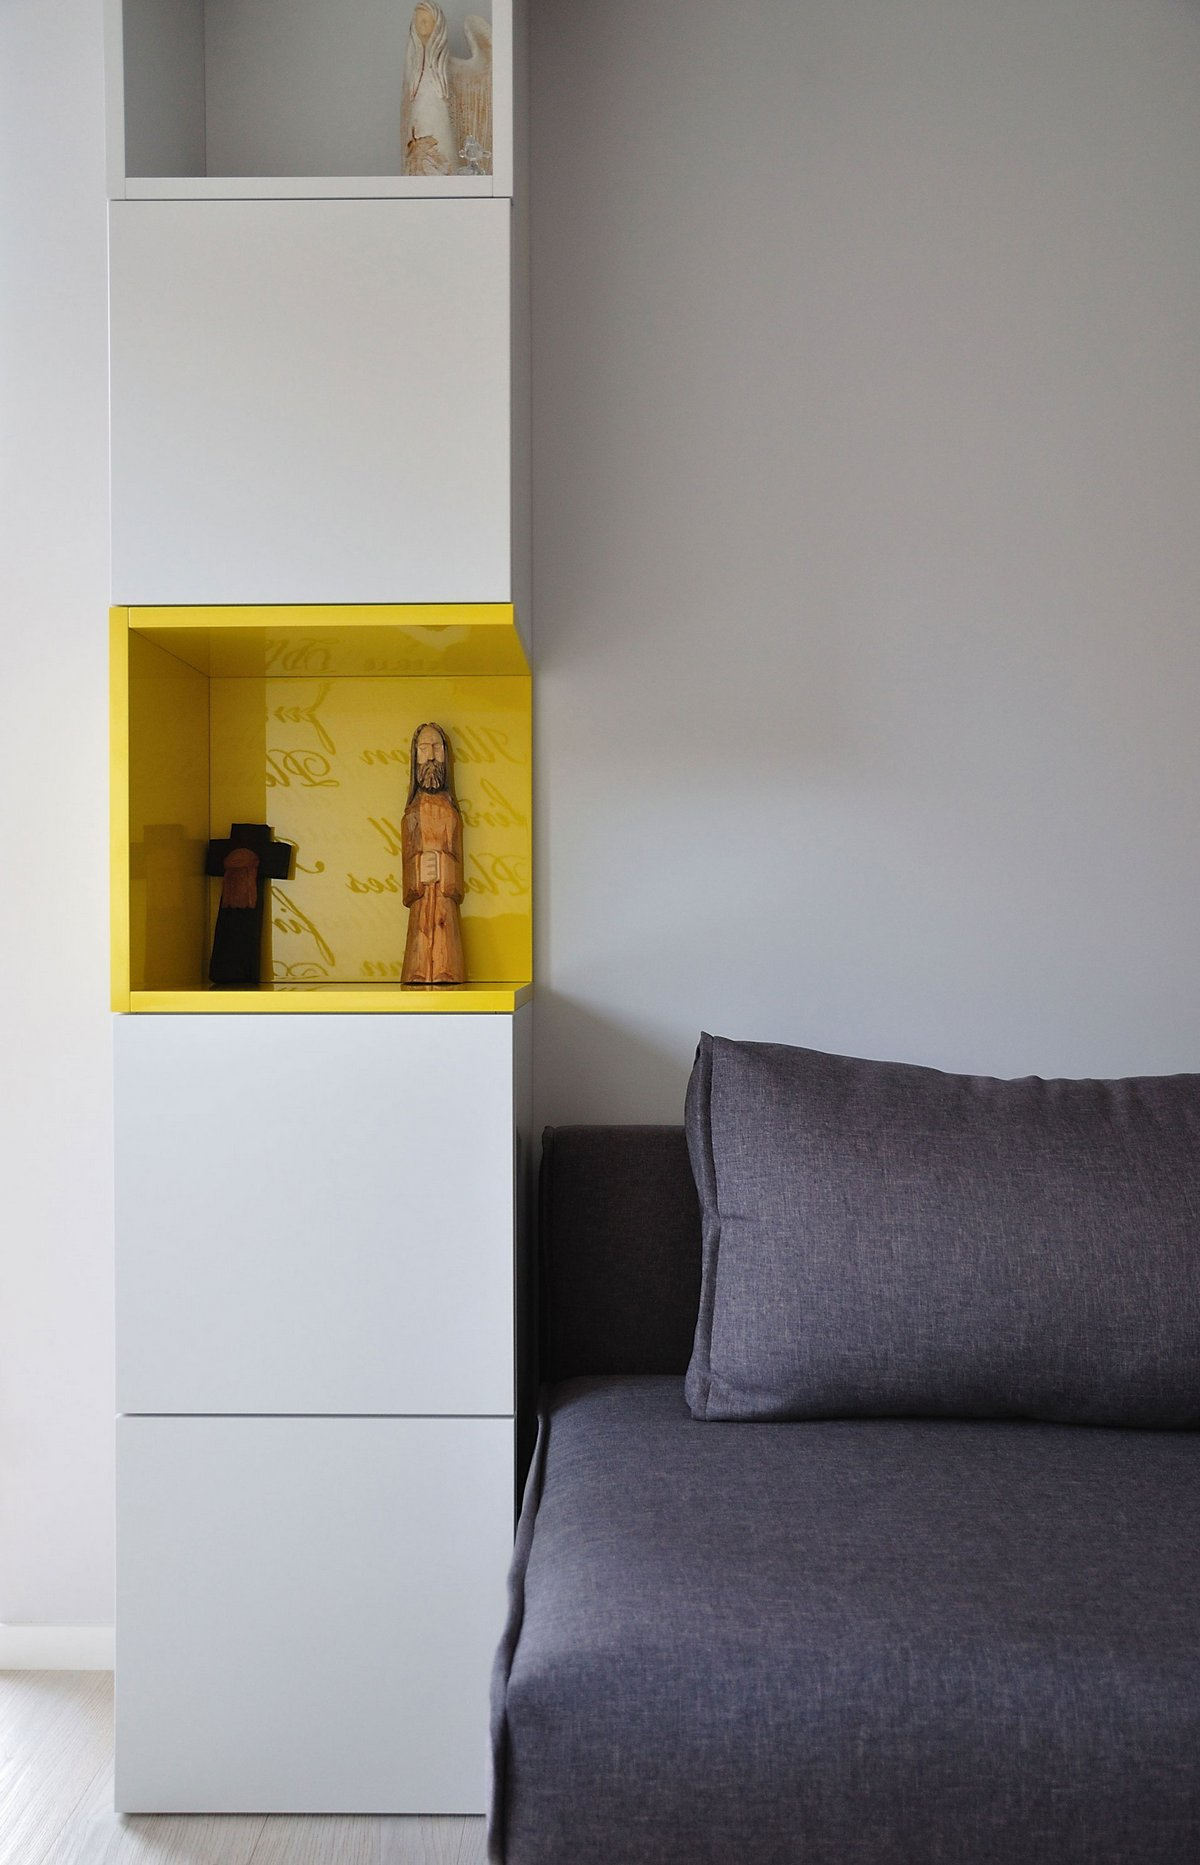 план квартиры, планировка квартиры, планировка трехкомнатной квартиры, интерьер трехкомнатной квартиры, дизайн интерьера квартиры фото, квартиры в Польше